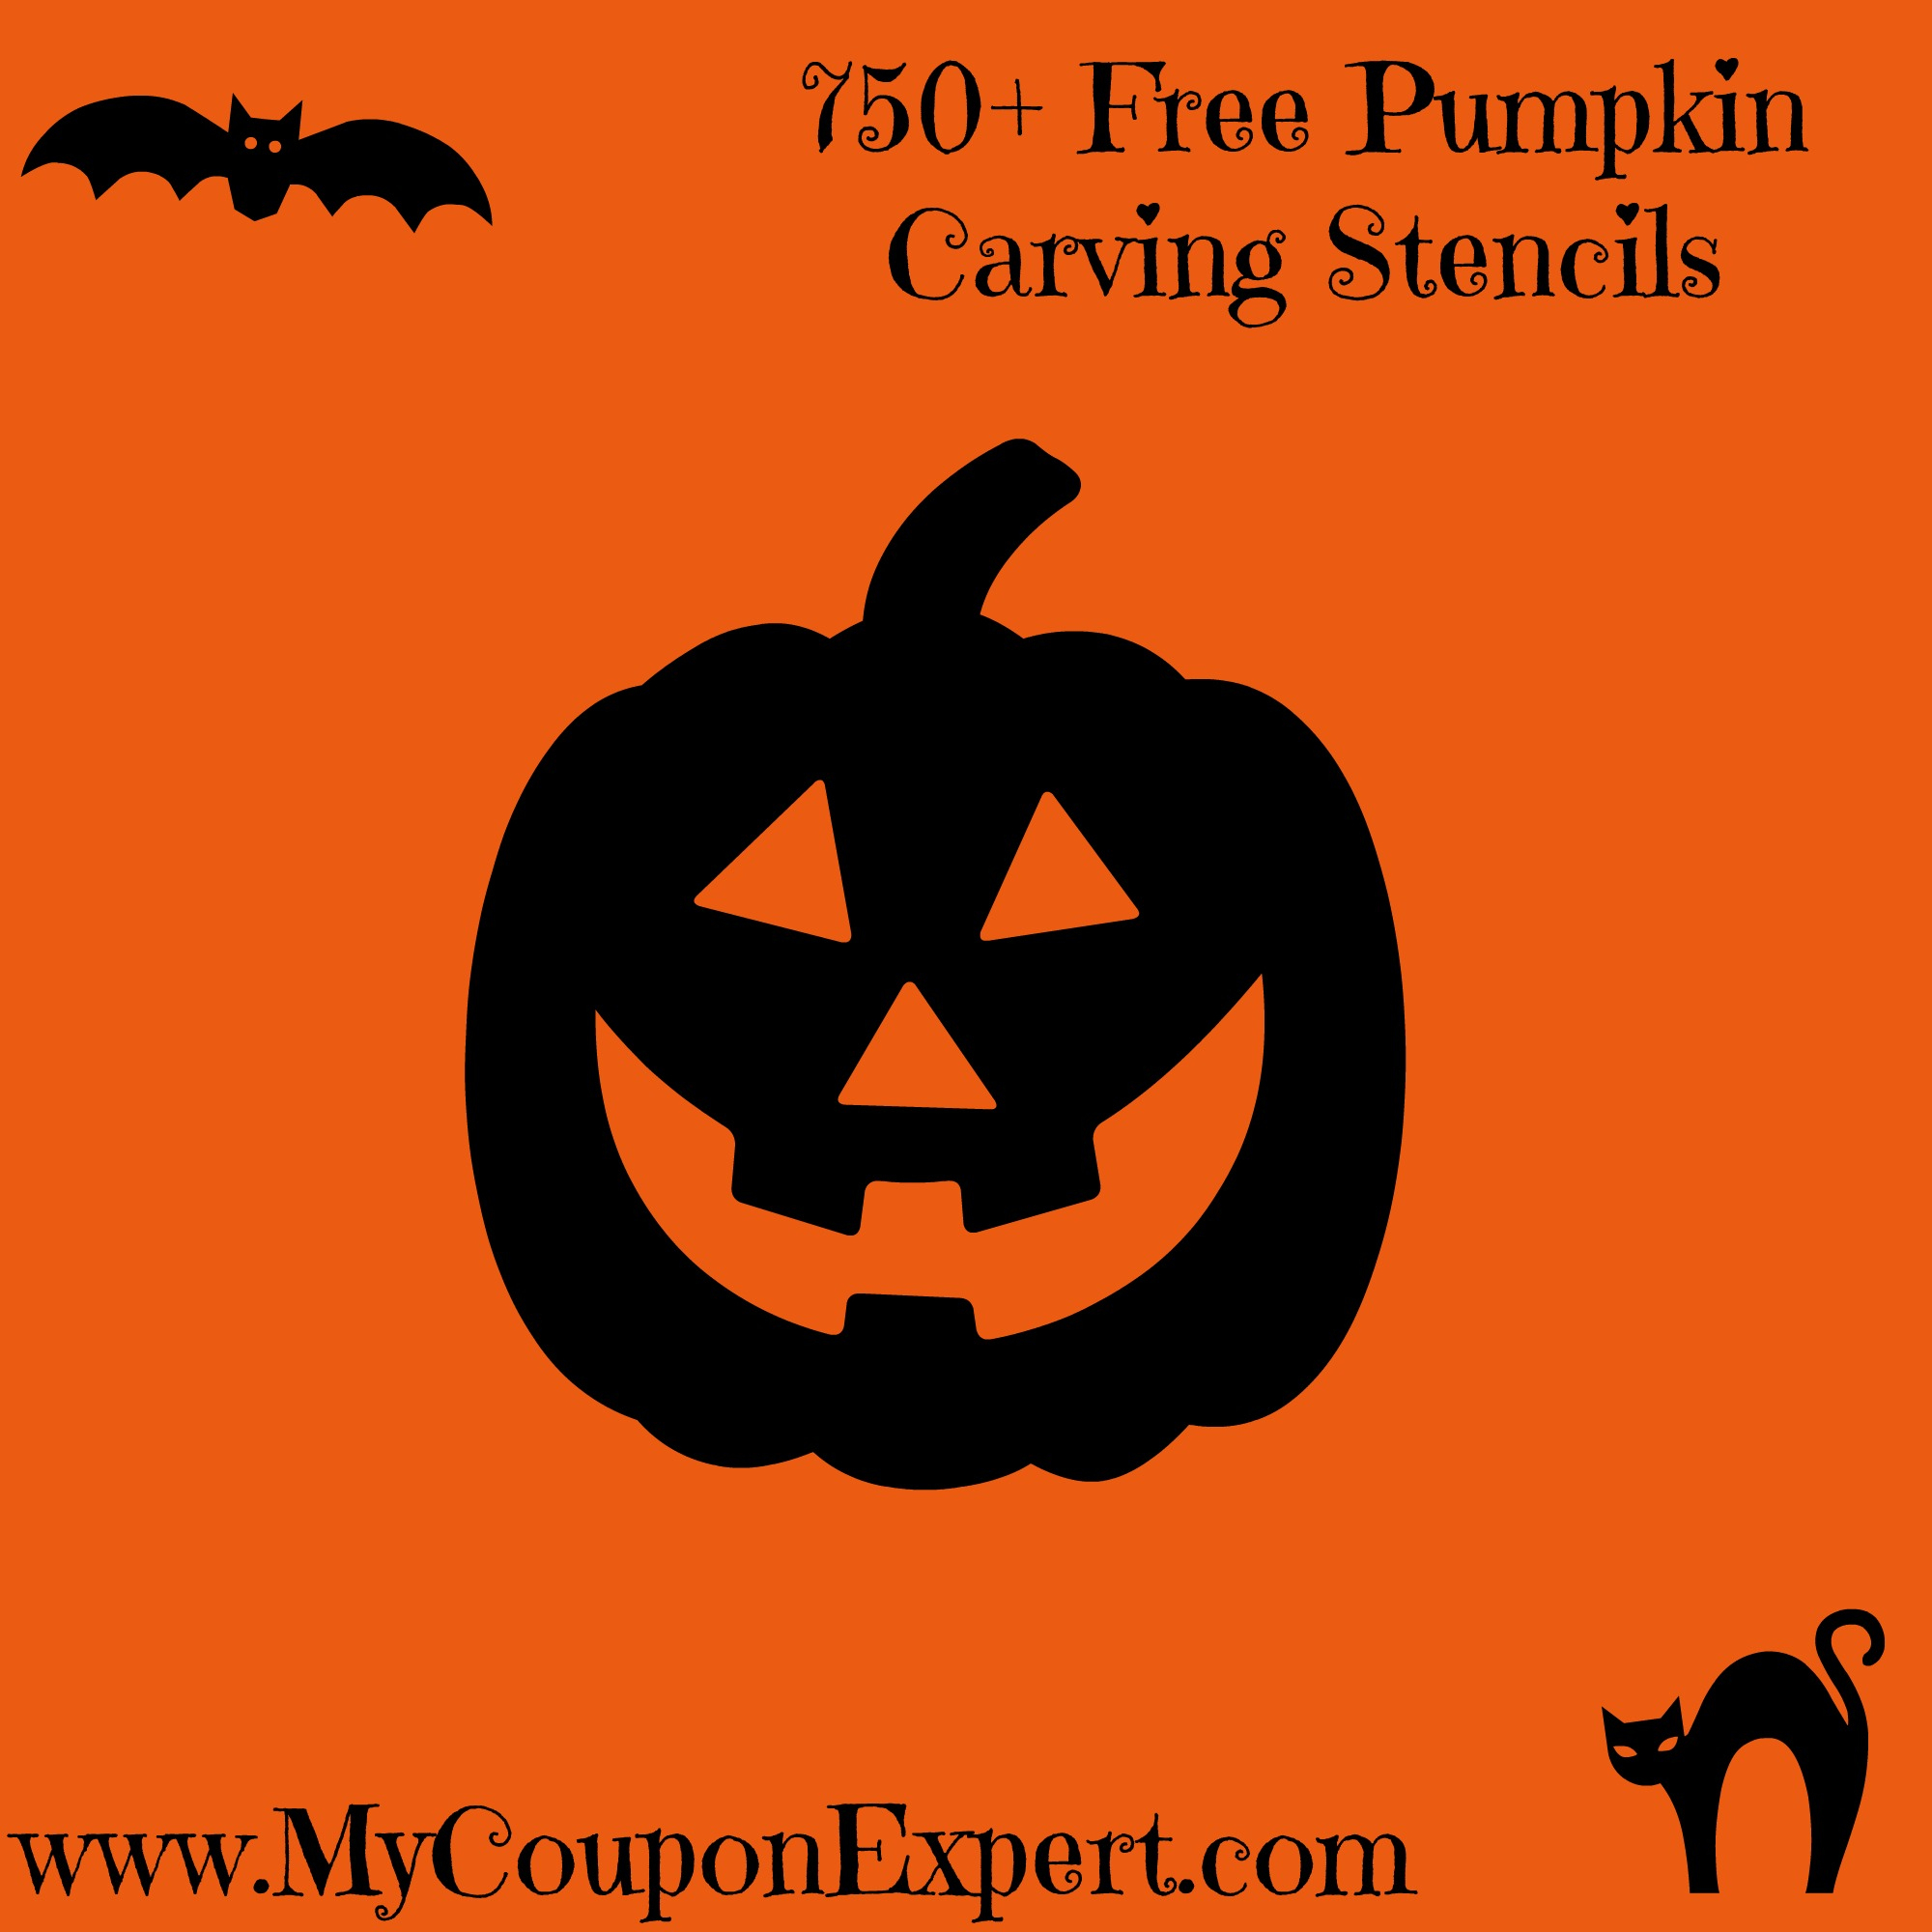 015 Free Pumpkin Templates Printable Template Ideas Carving - Pumpkin Carving Patterns Free Printable